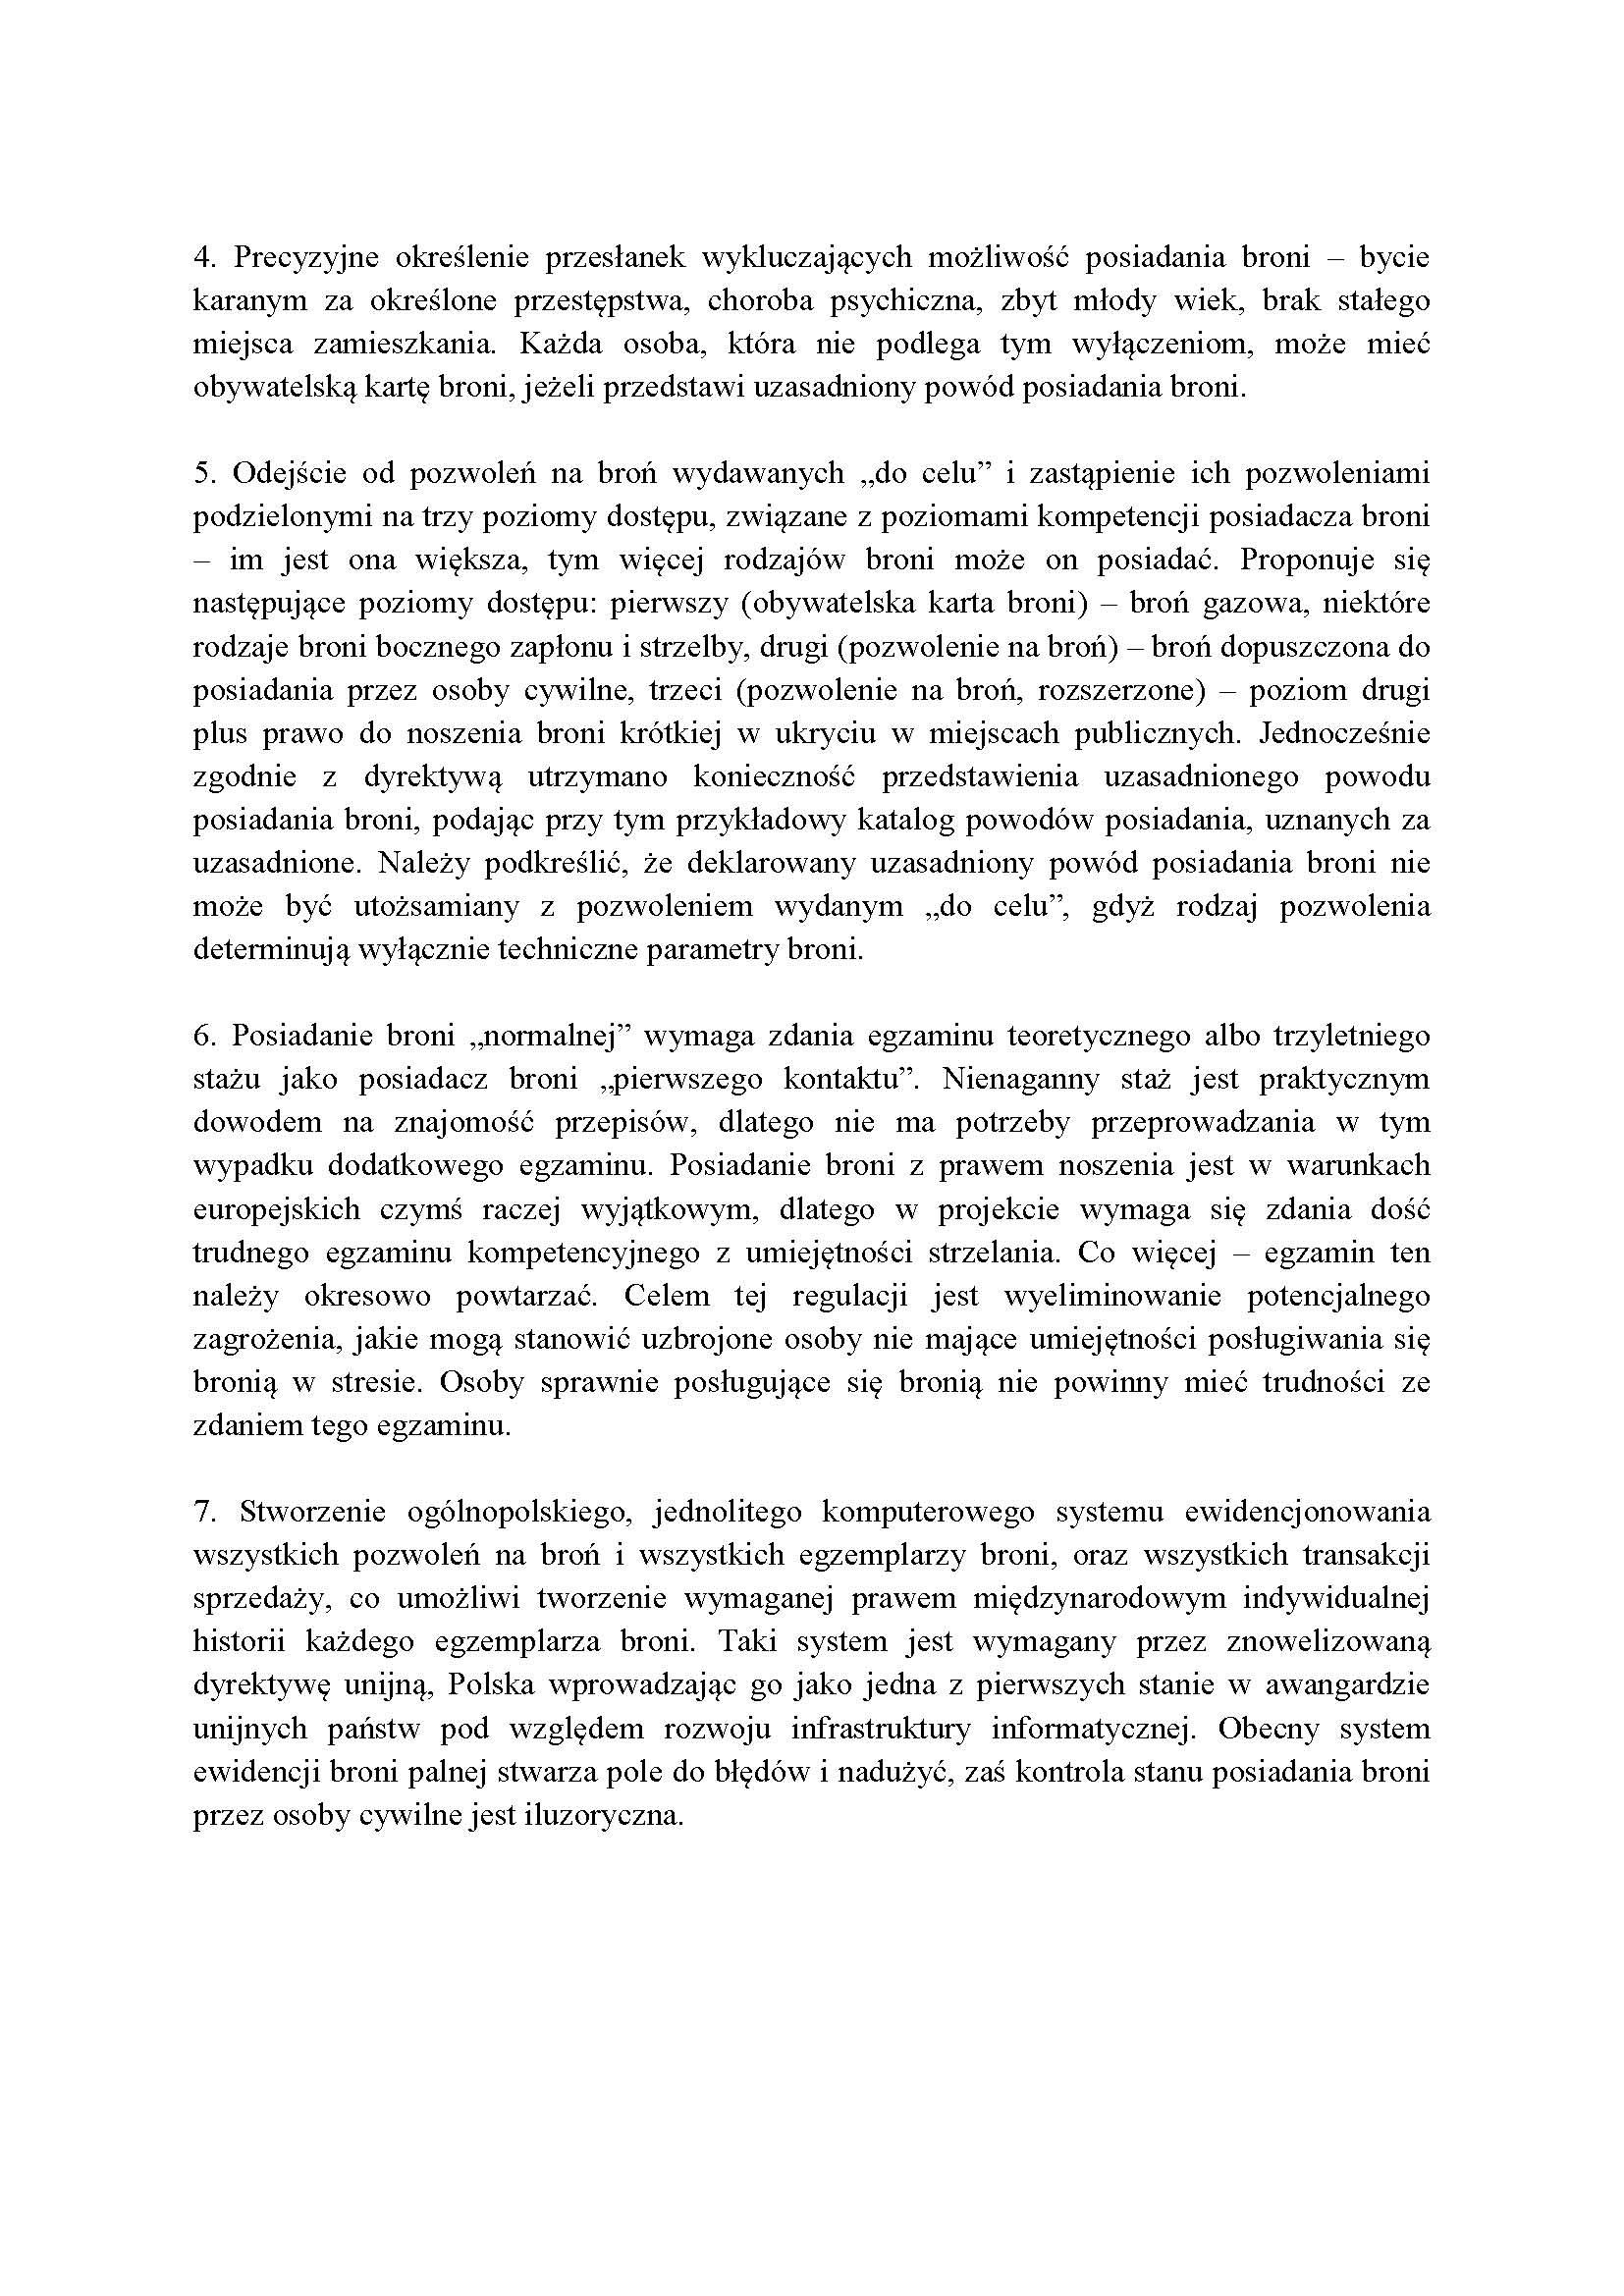 FRSwP_projekt_ustawy_20151125_Strona_29